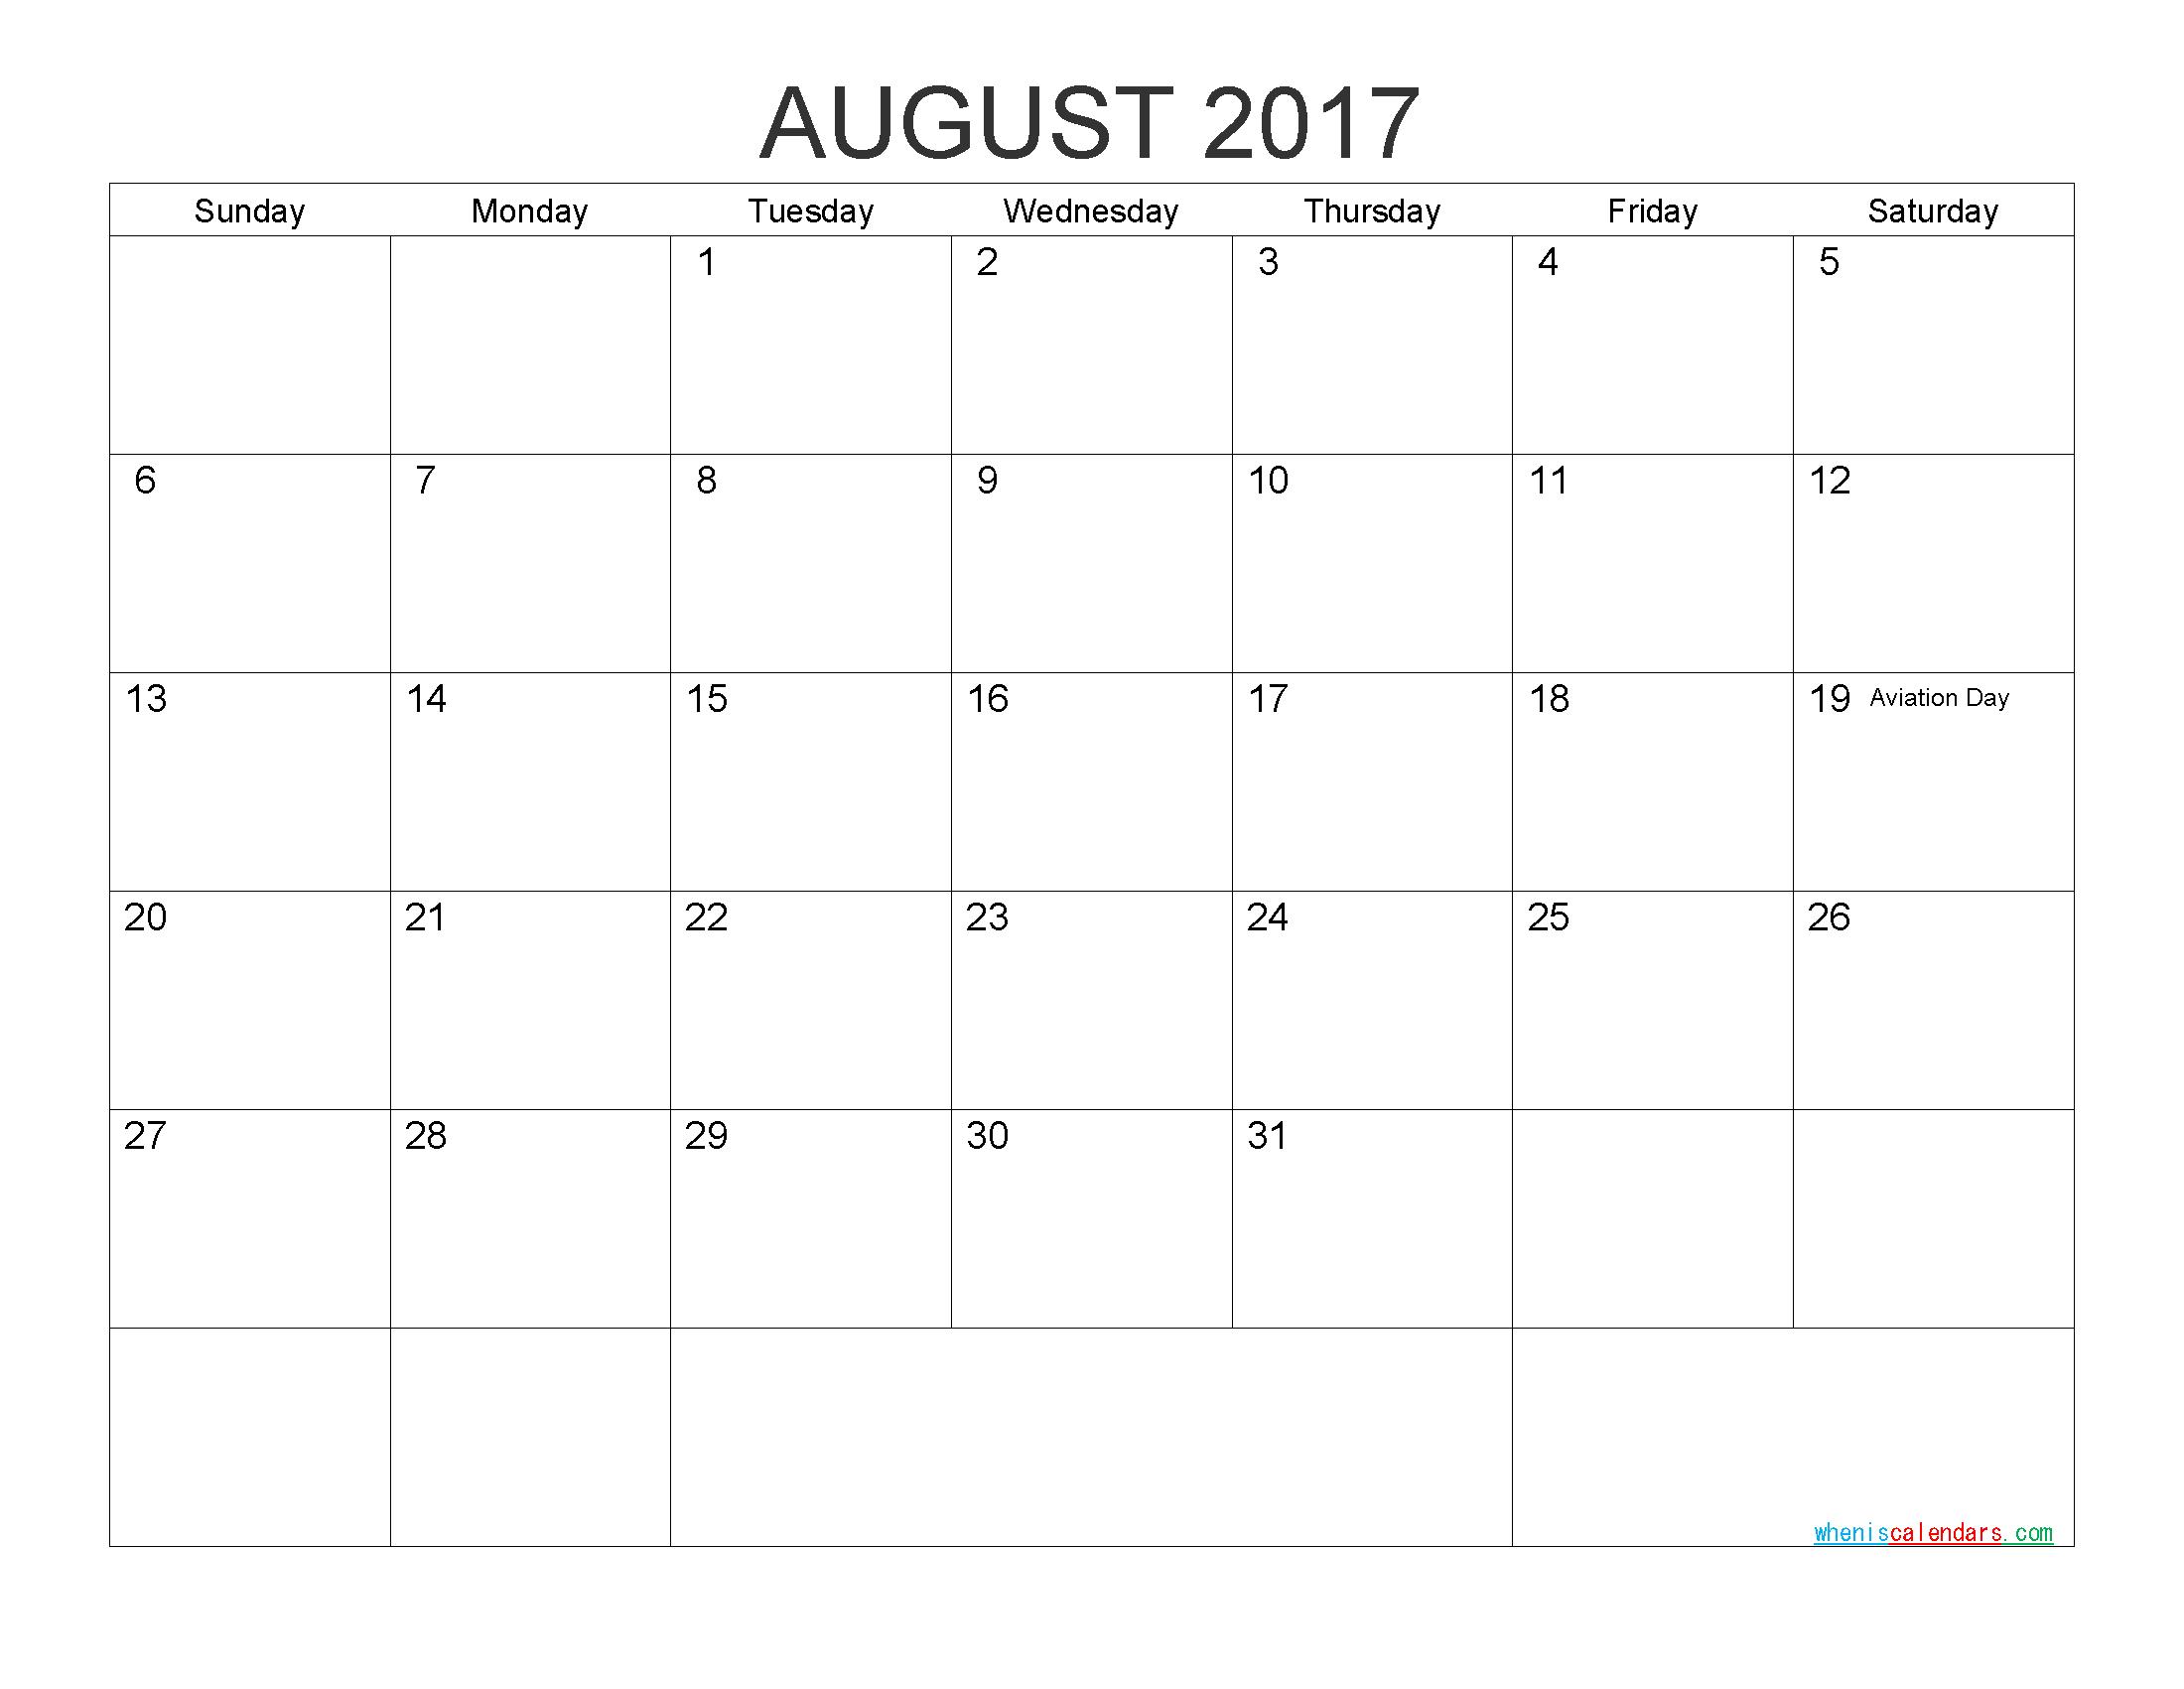 Free Printable Calendar August 2017 As Pdf And Image | Free - Free Printable August 2017